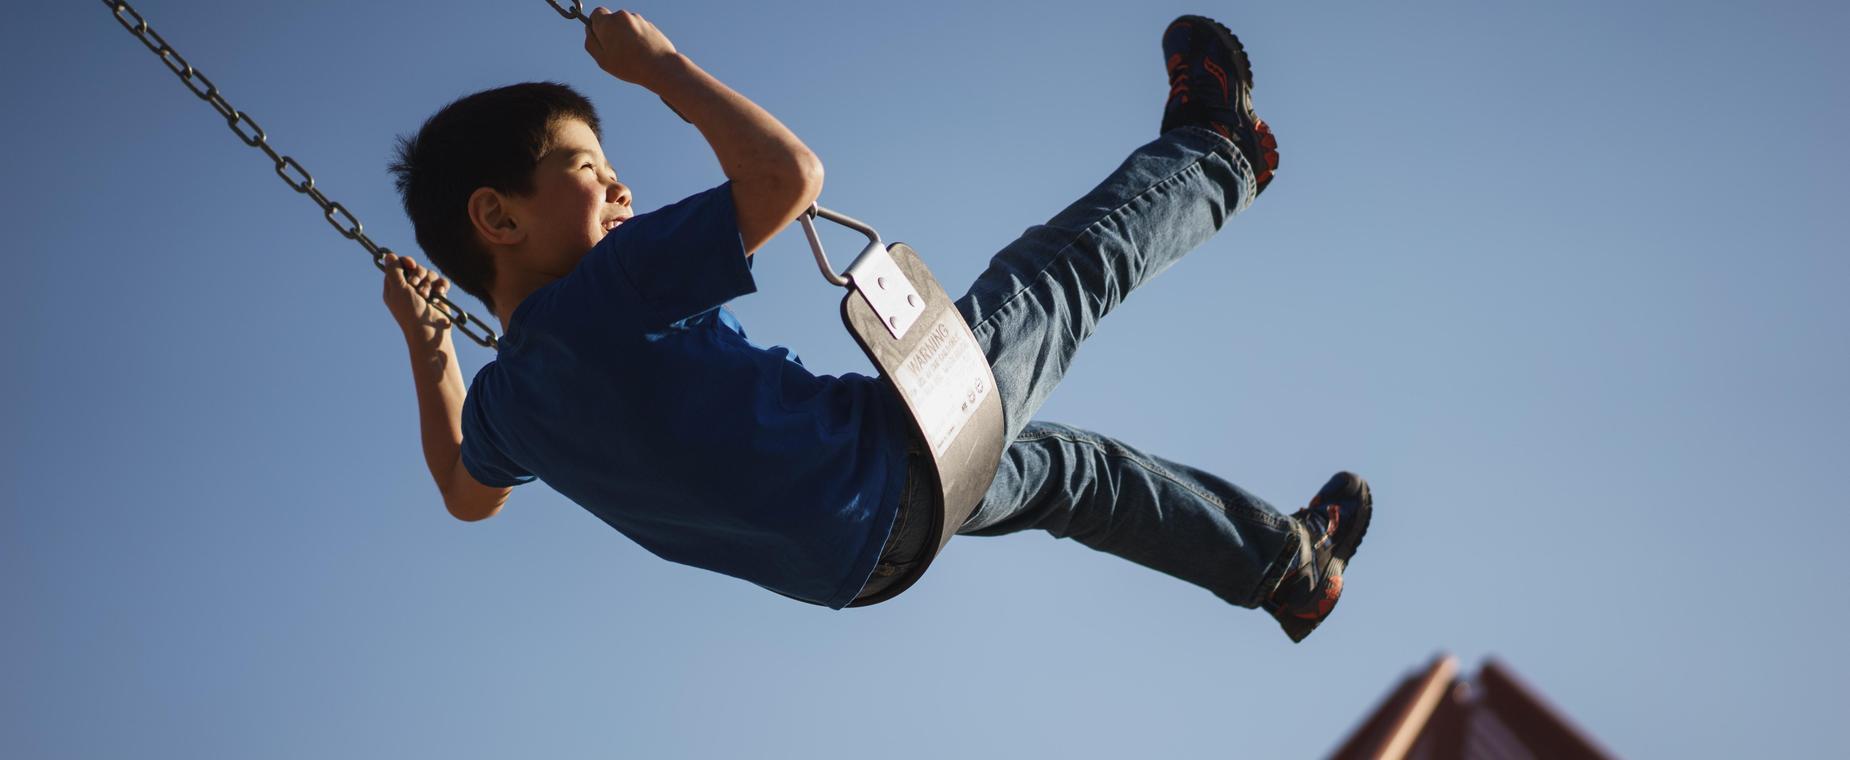 Child swinging on a playground swing